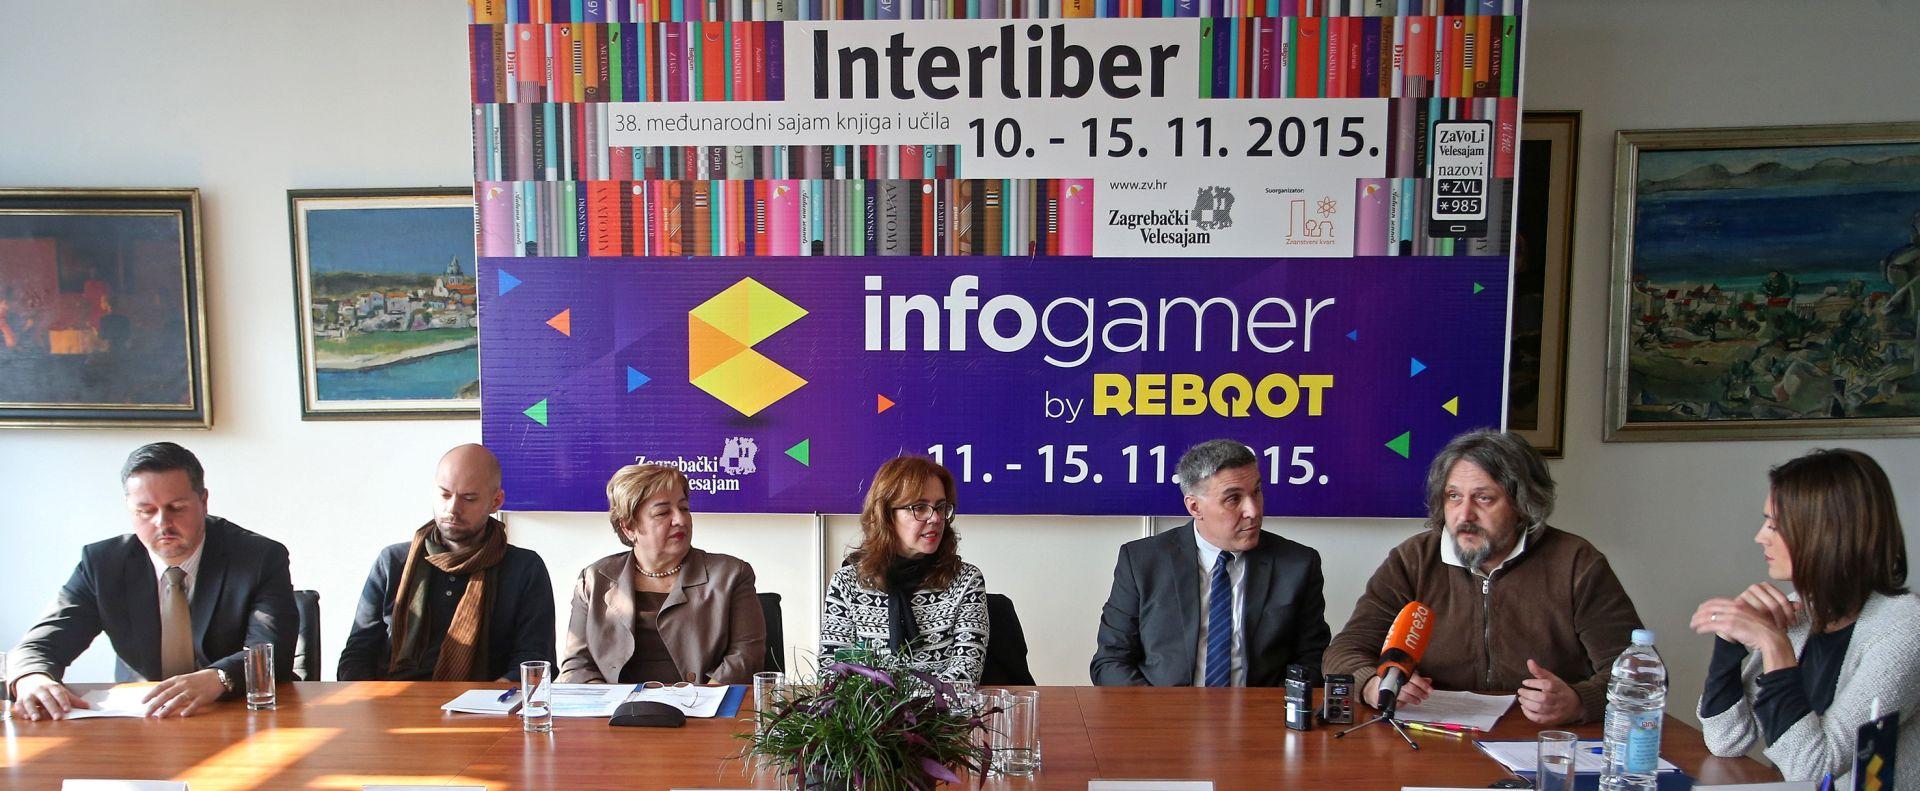 INTERLIBER: Još jedna bogata zagrebačka književna jesen